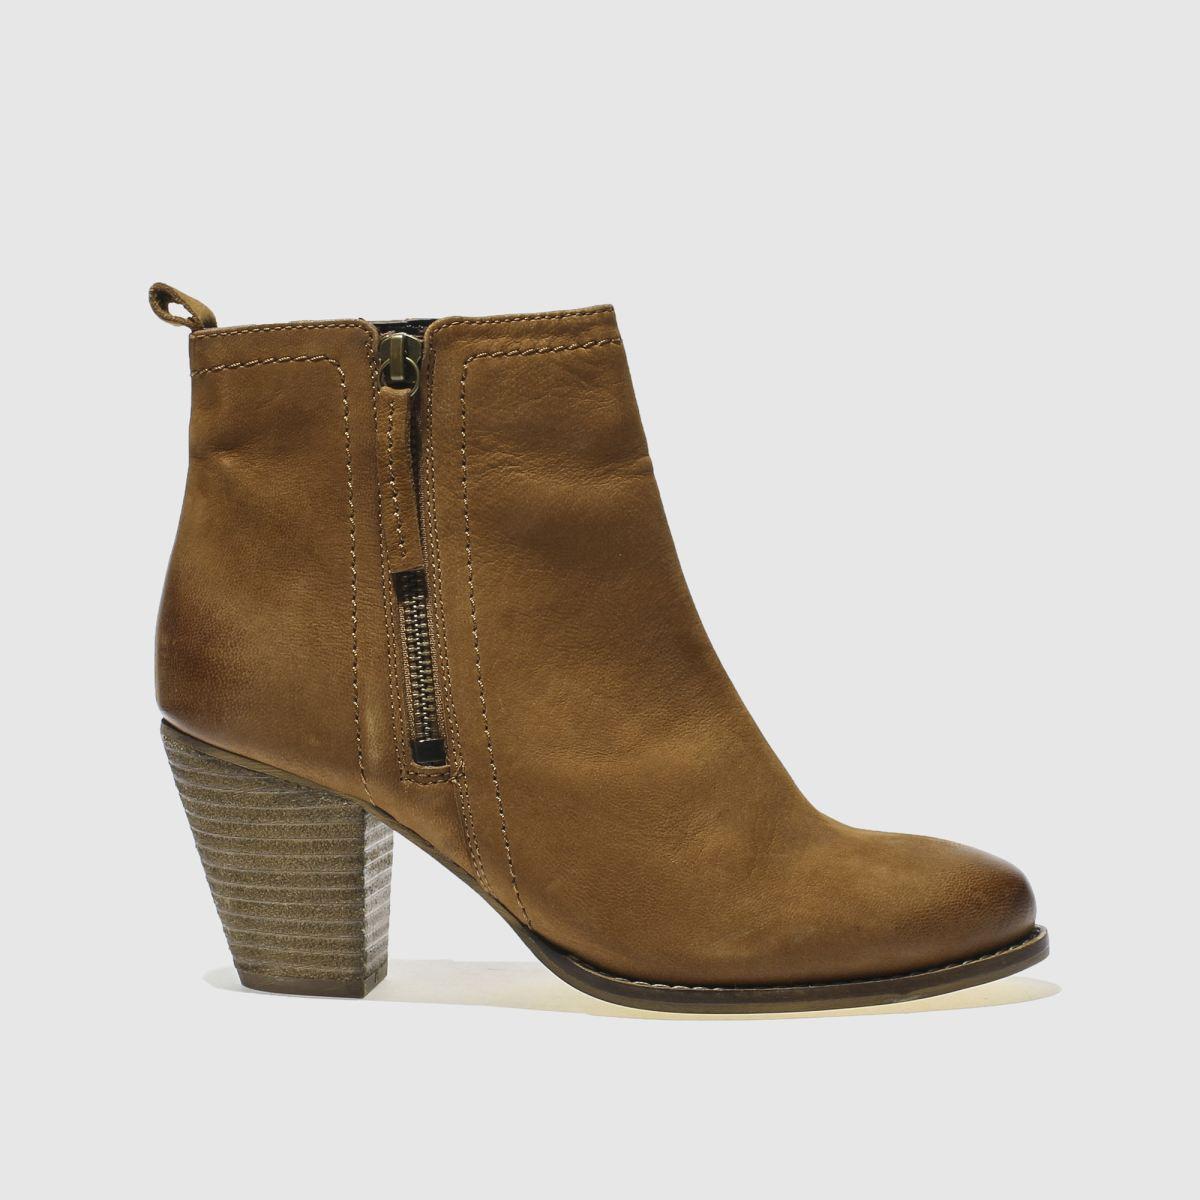 Schuh Tan Champ Boots